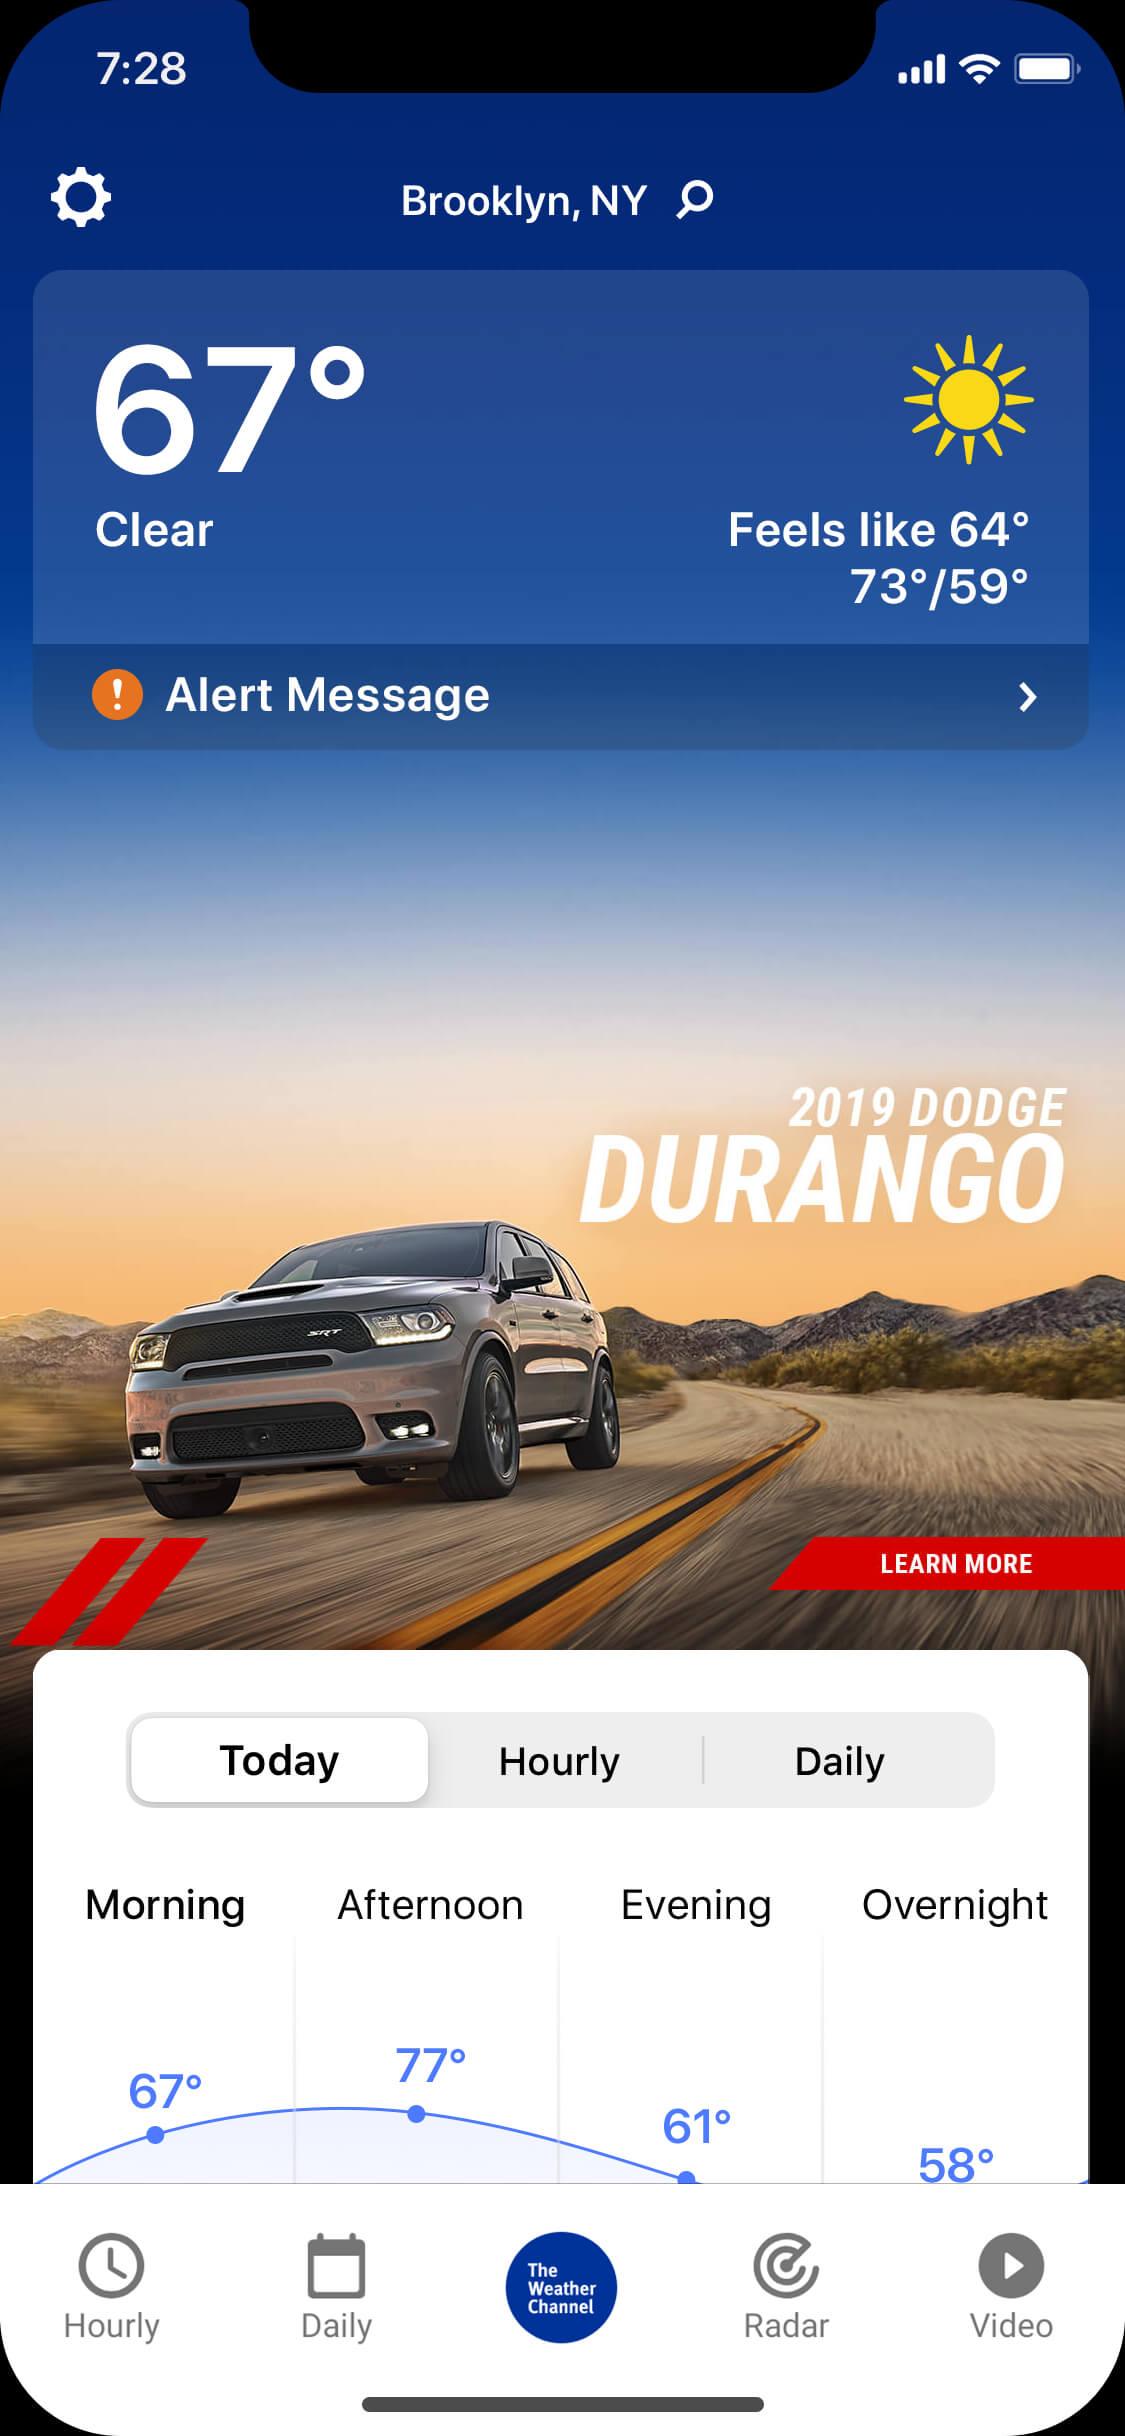 Durango_clear_day